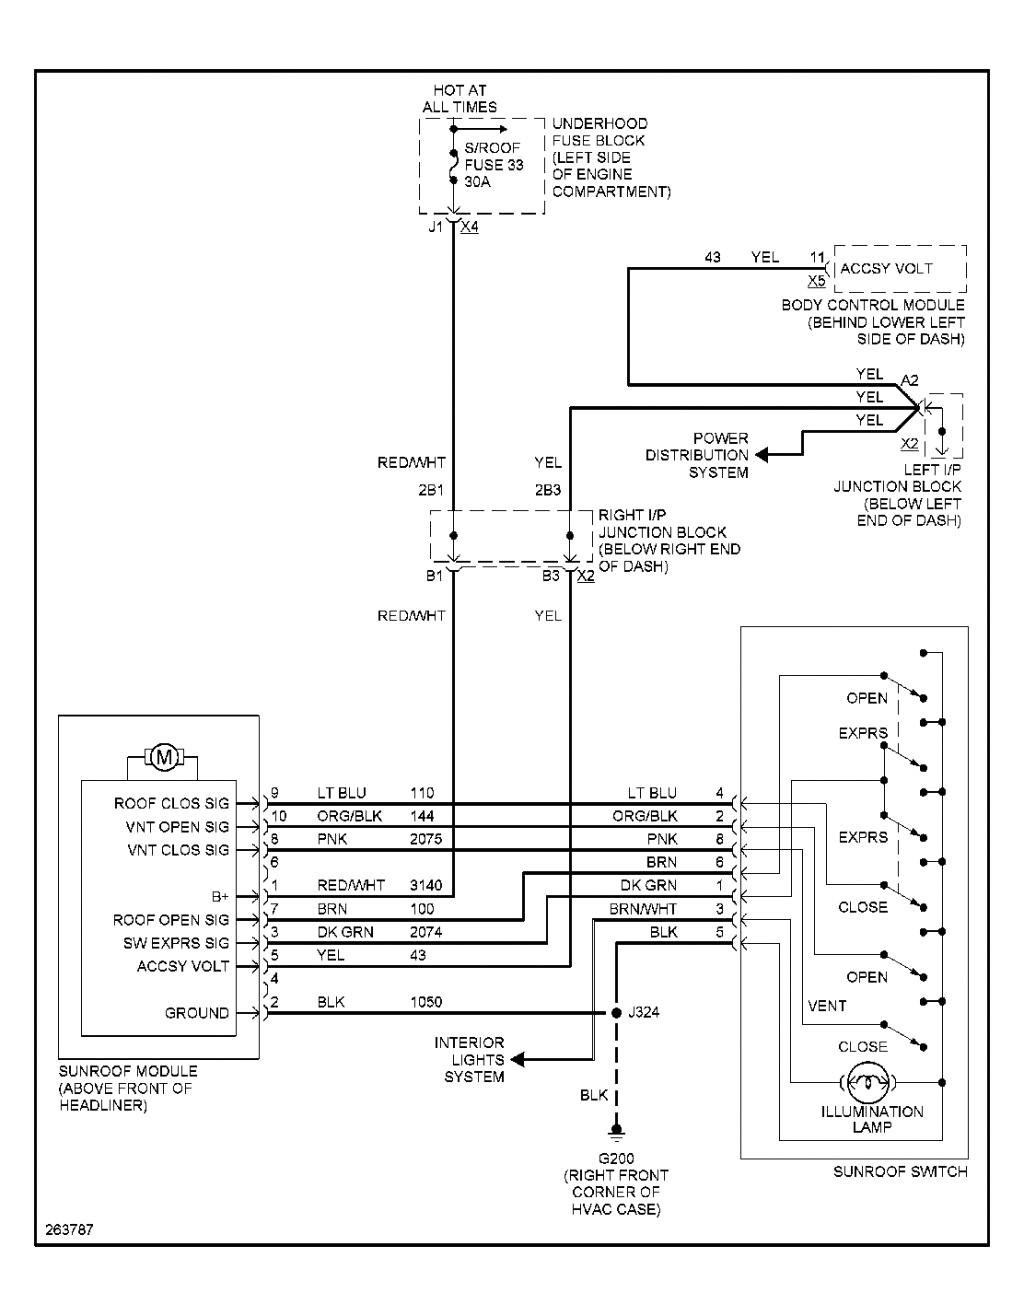 hight resolution of gmos 01 wiring diagram wiring diagram for you gmos lan 01 wiring diagram gmos 01 wiring diagram